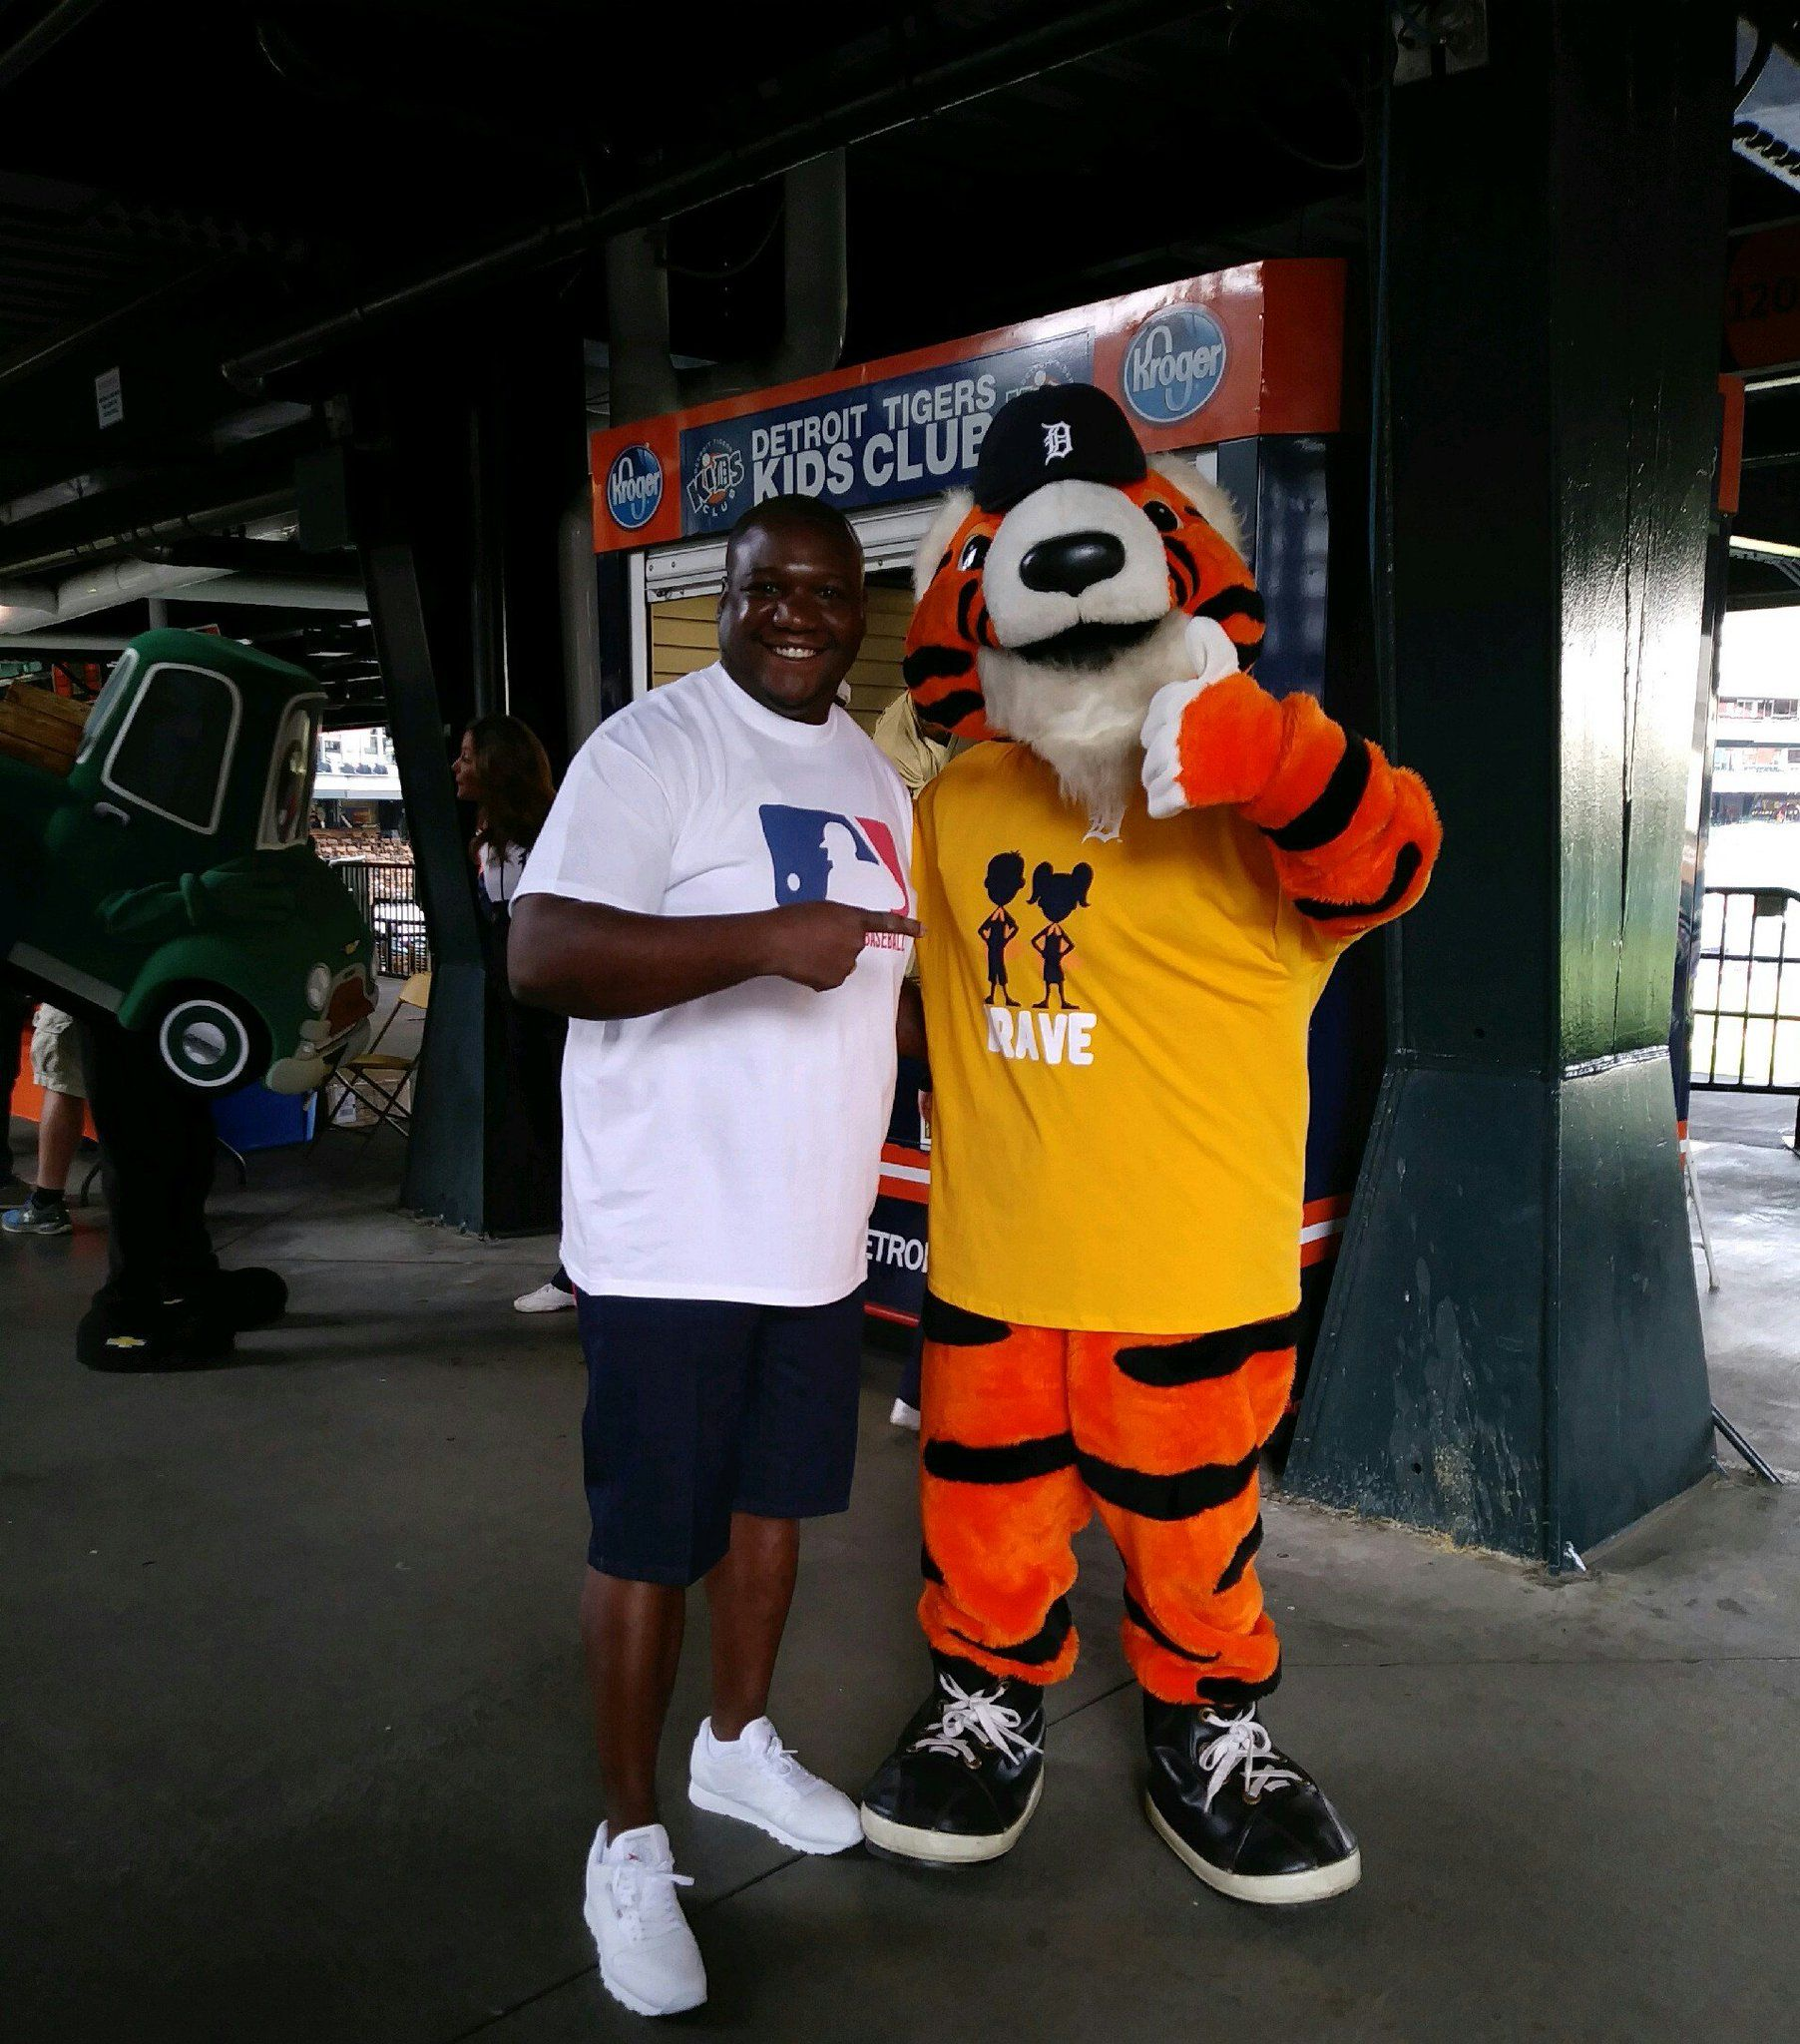 Medium Crop Of Detroit Tigers Twitter